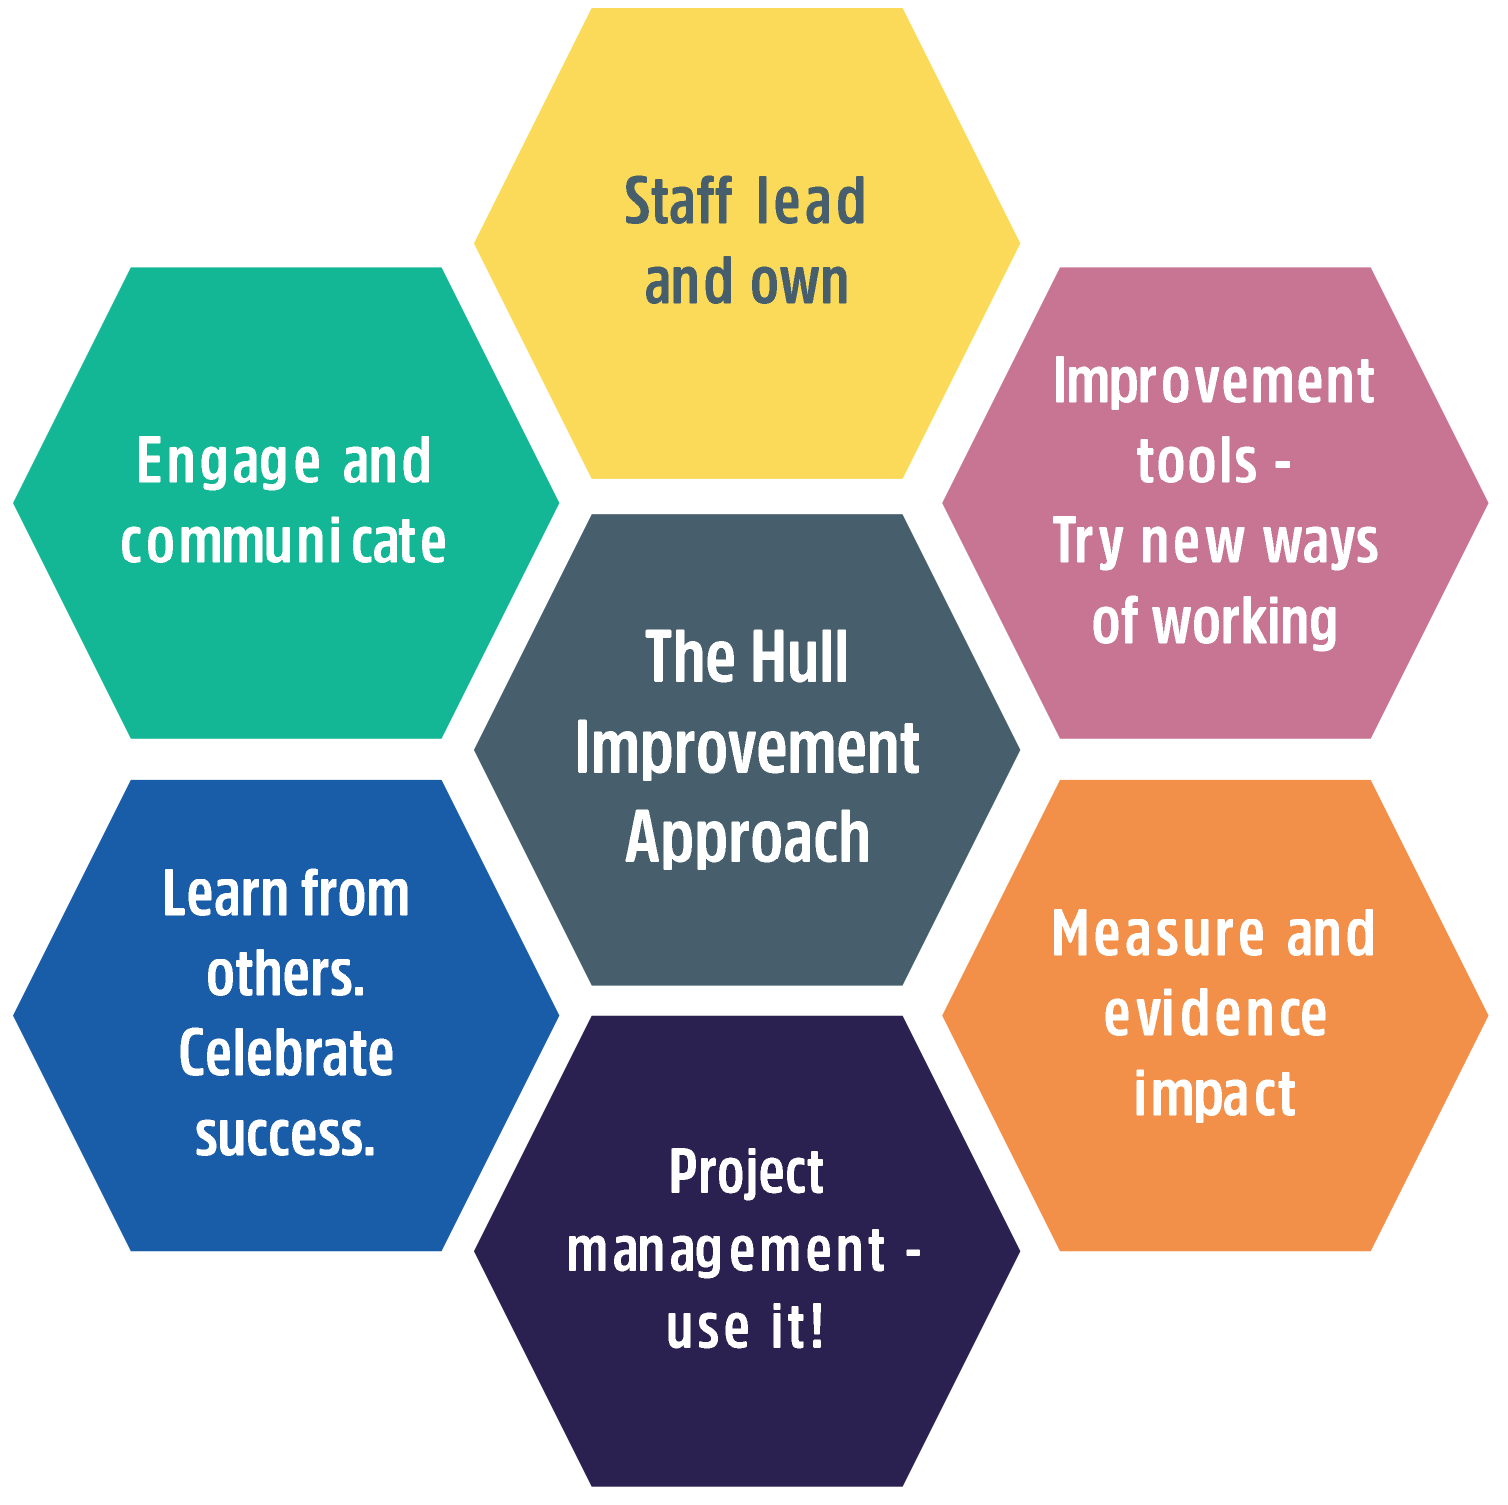 The Hospital Improvement Programme Approach